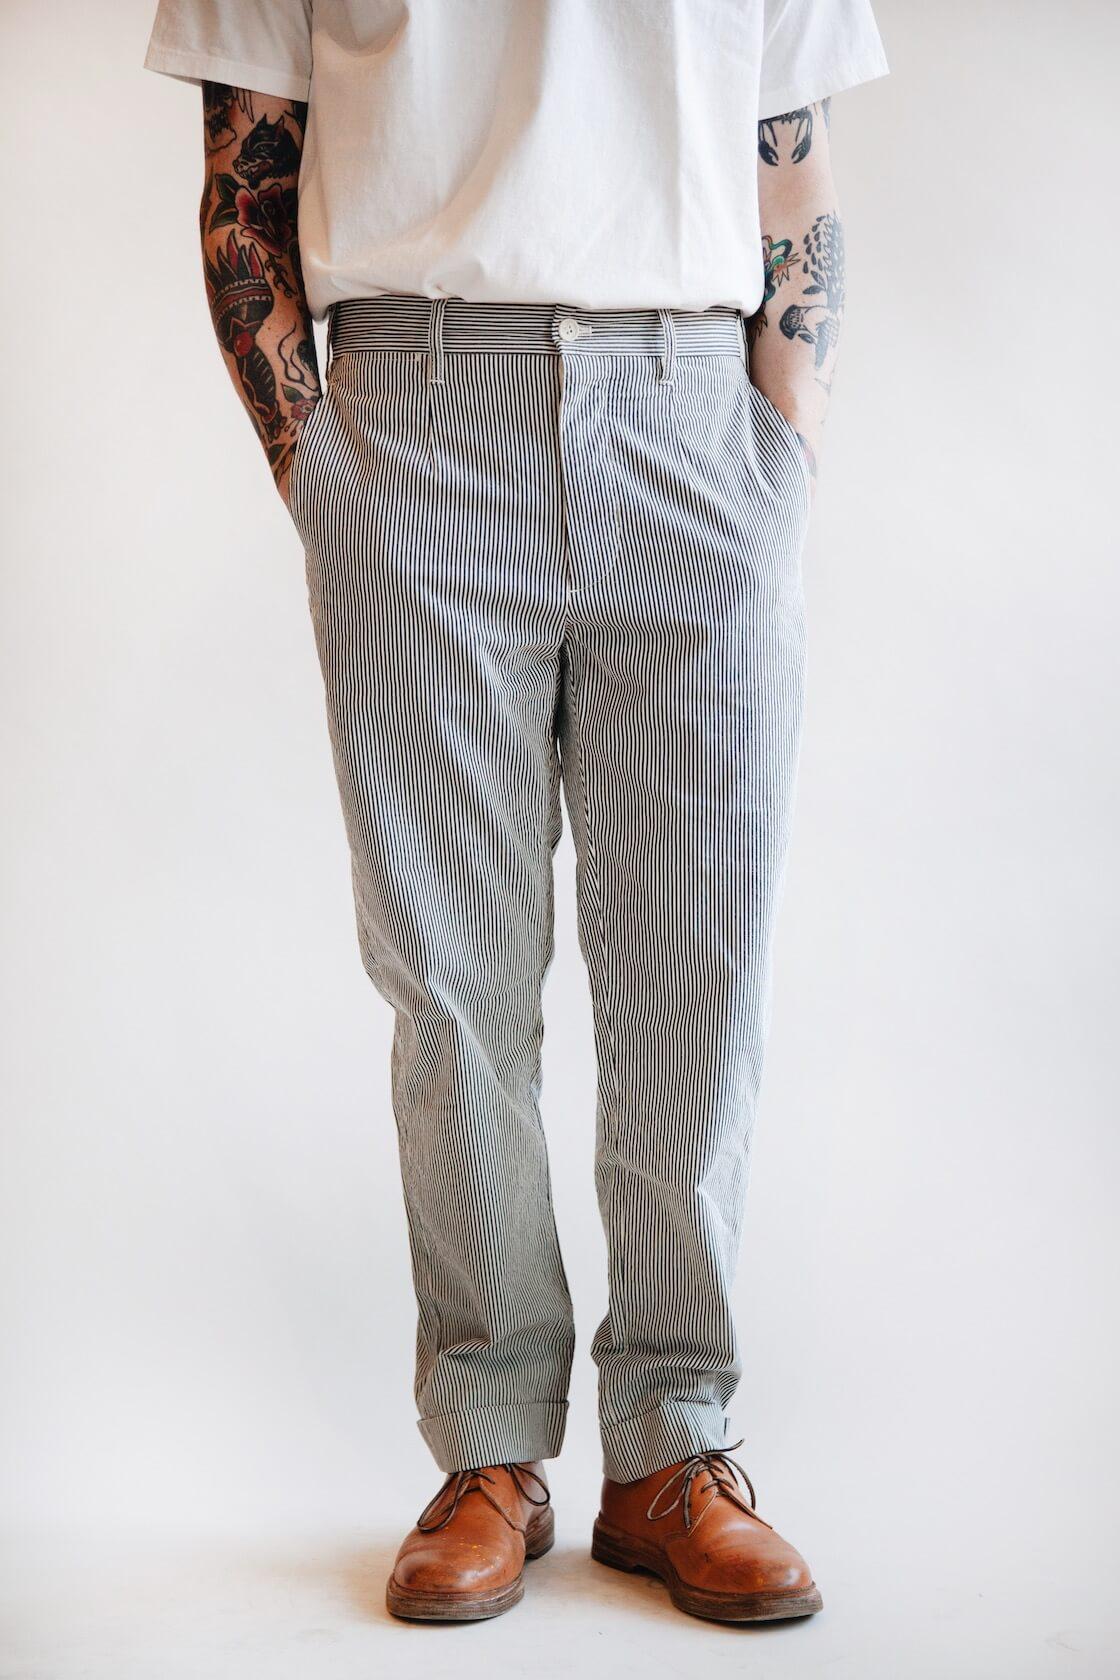 engineered garments andover pants on body